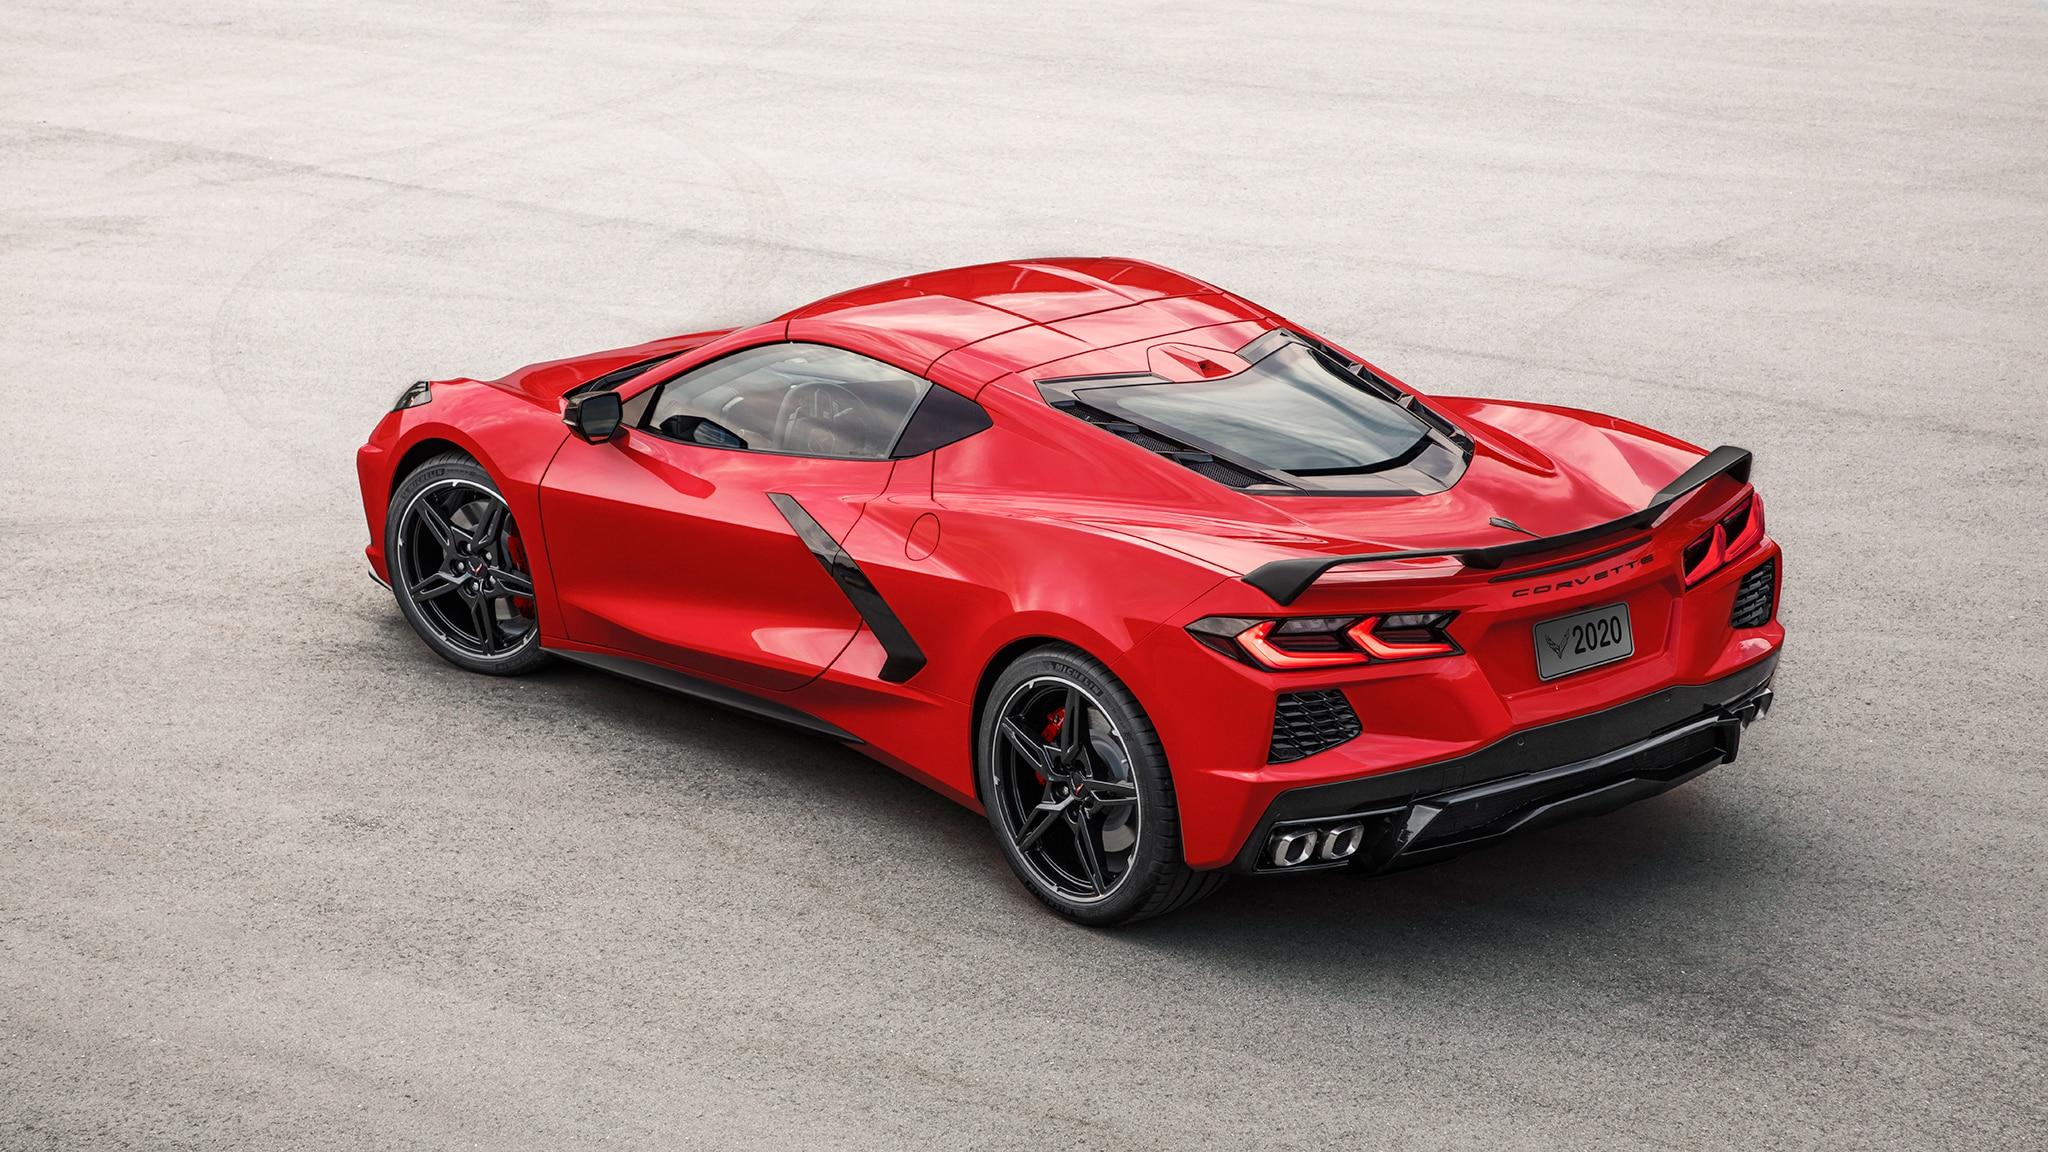 2020 Chevrolet Corvette C8 Specs Power Torque And More